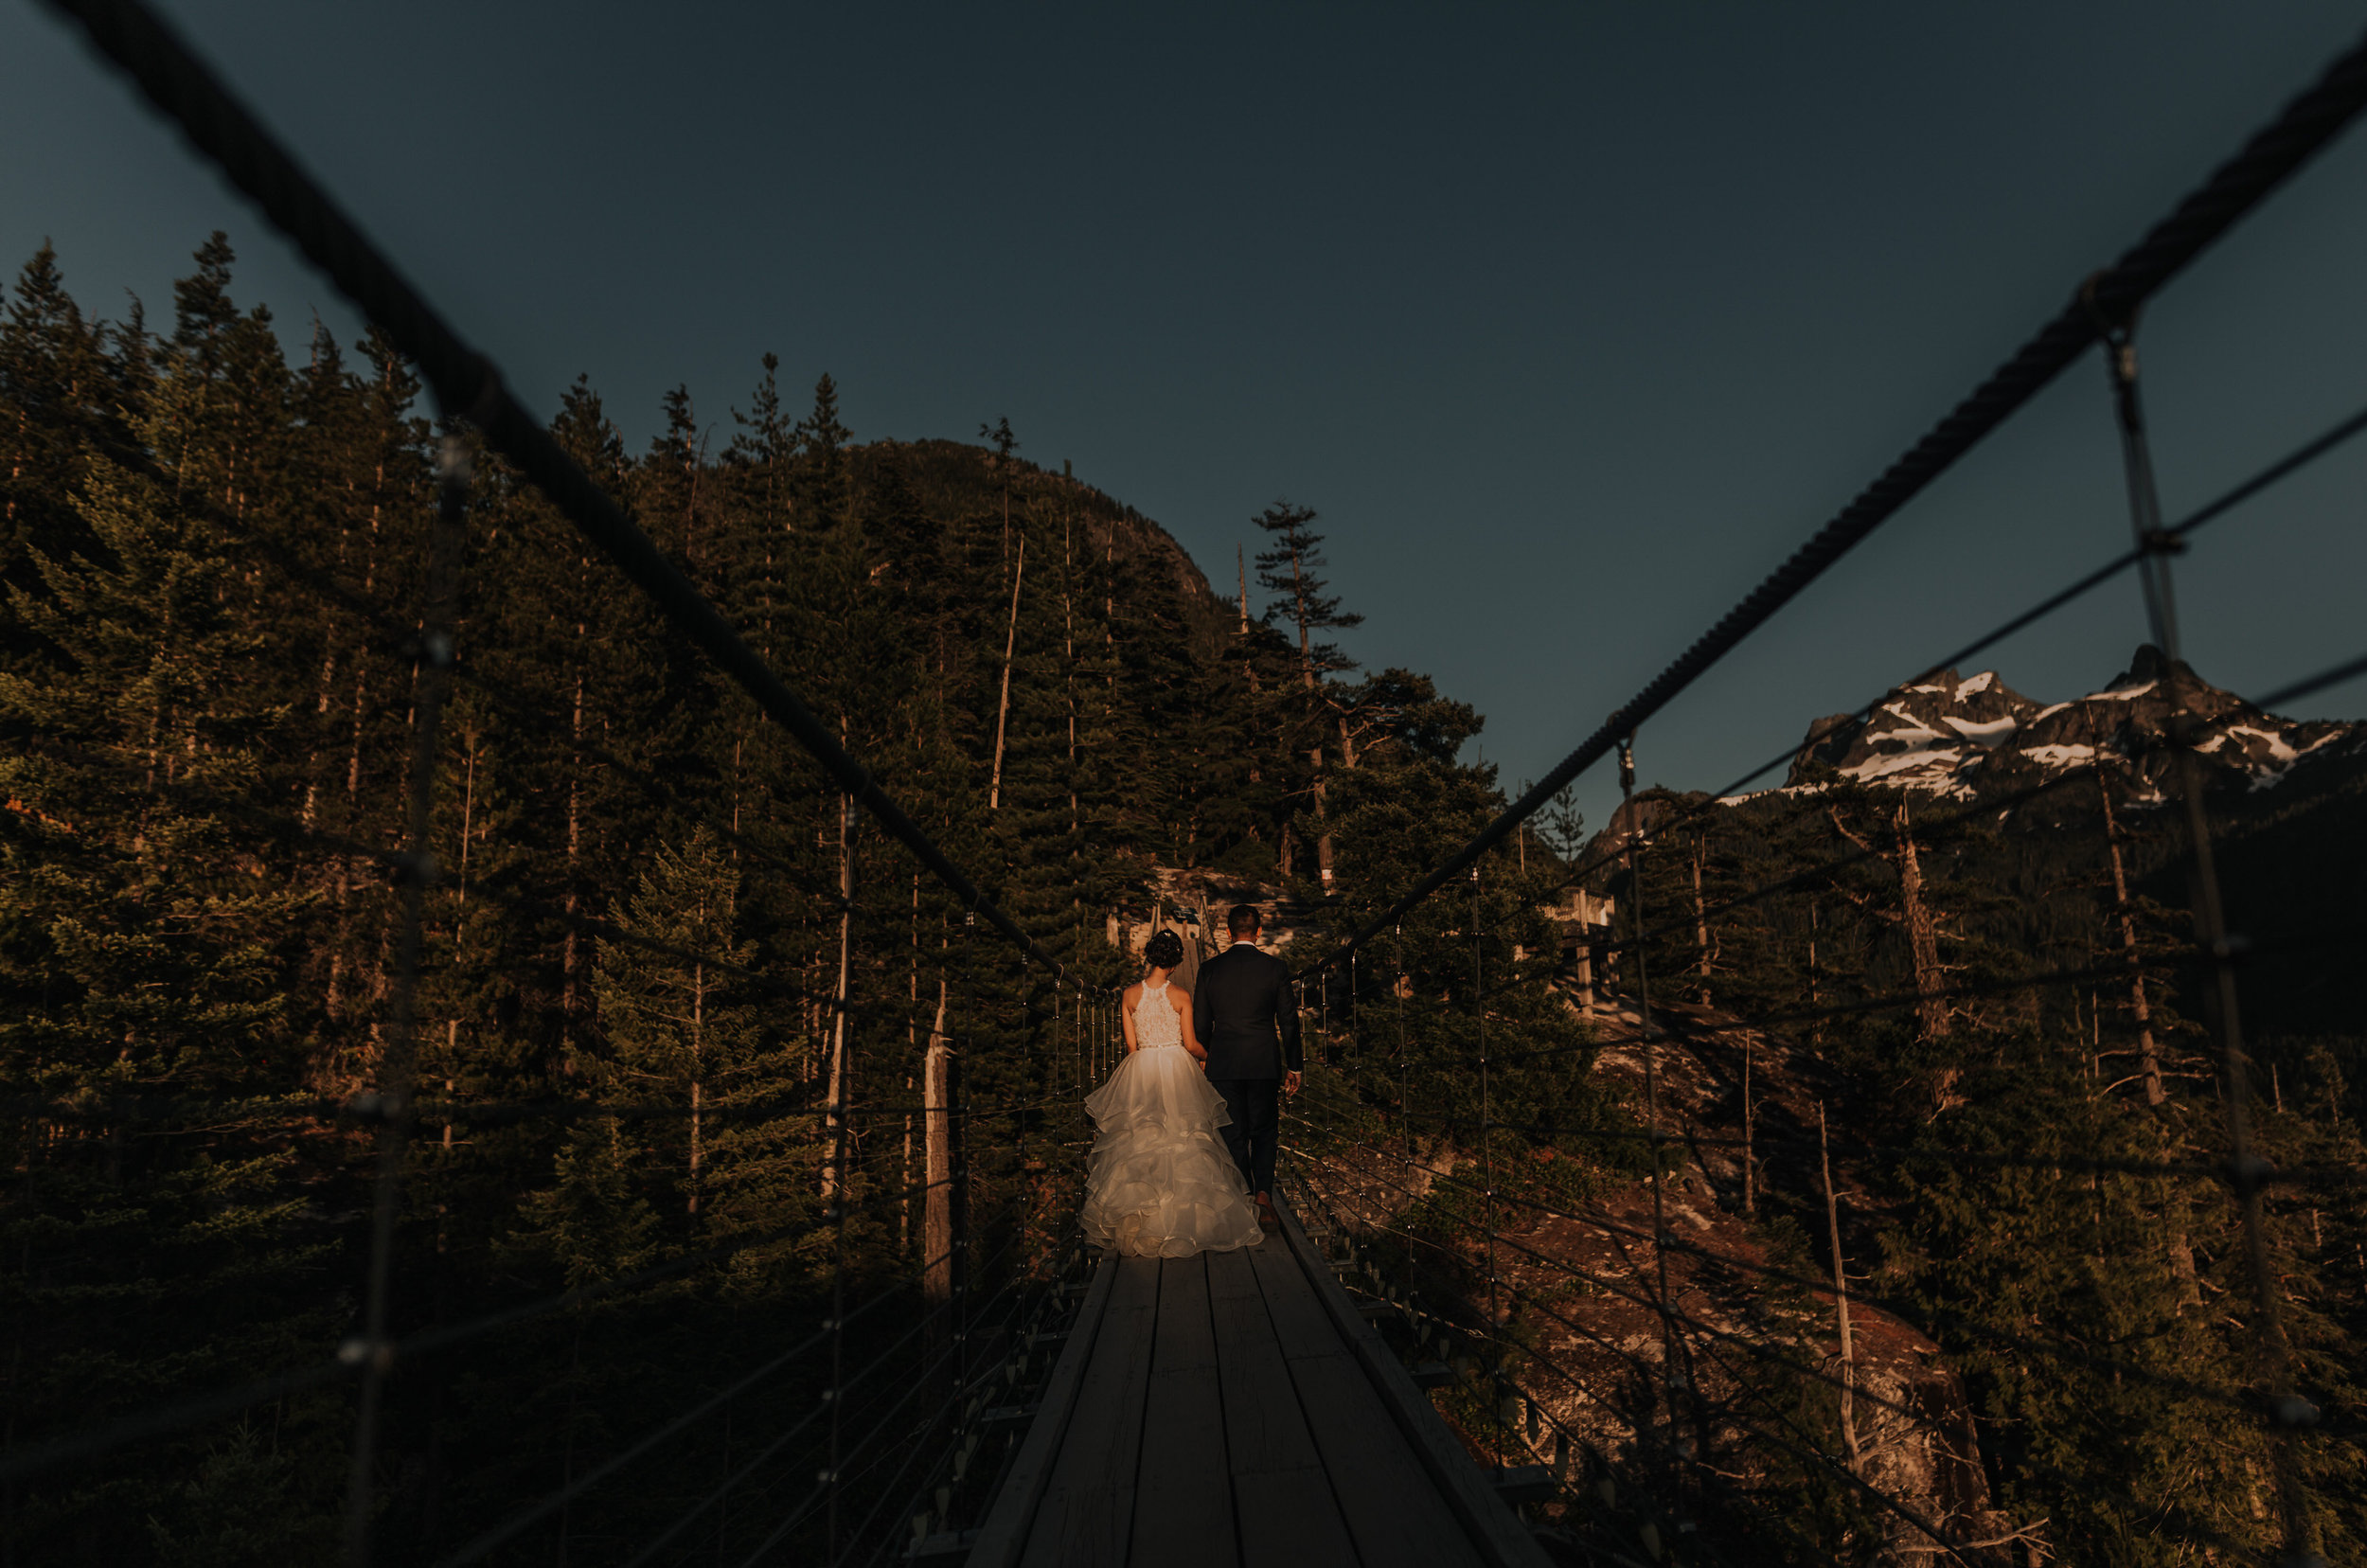 Squamish Wedding Photographer - Sea to Sky Gondola Wedding Photos -  Vancouver Wedding Photographer & Videographer - Sunshine Coast Wedding Photos - Sunshine Coast Wedding Photographer - Jennifer Picard Photography - IMG_5094.jpg